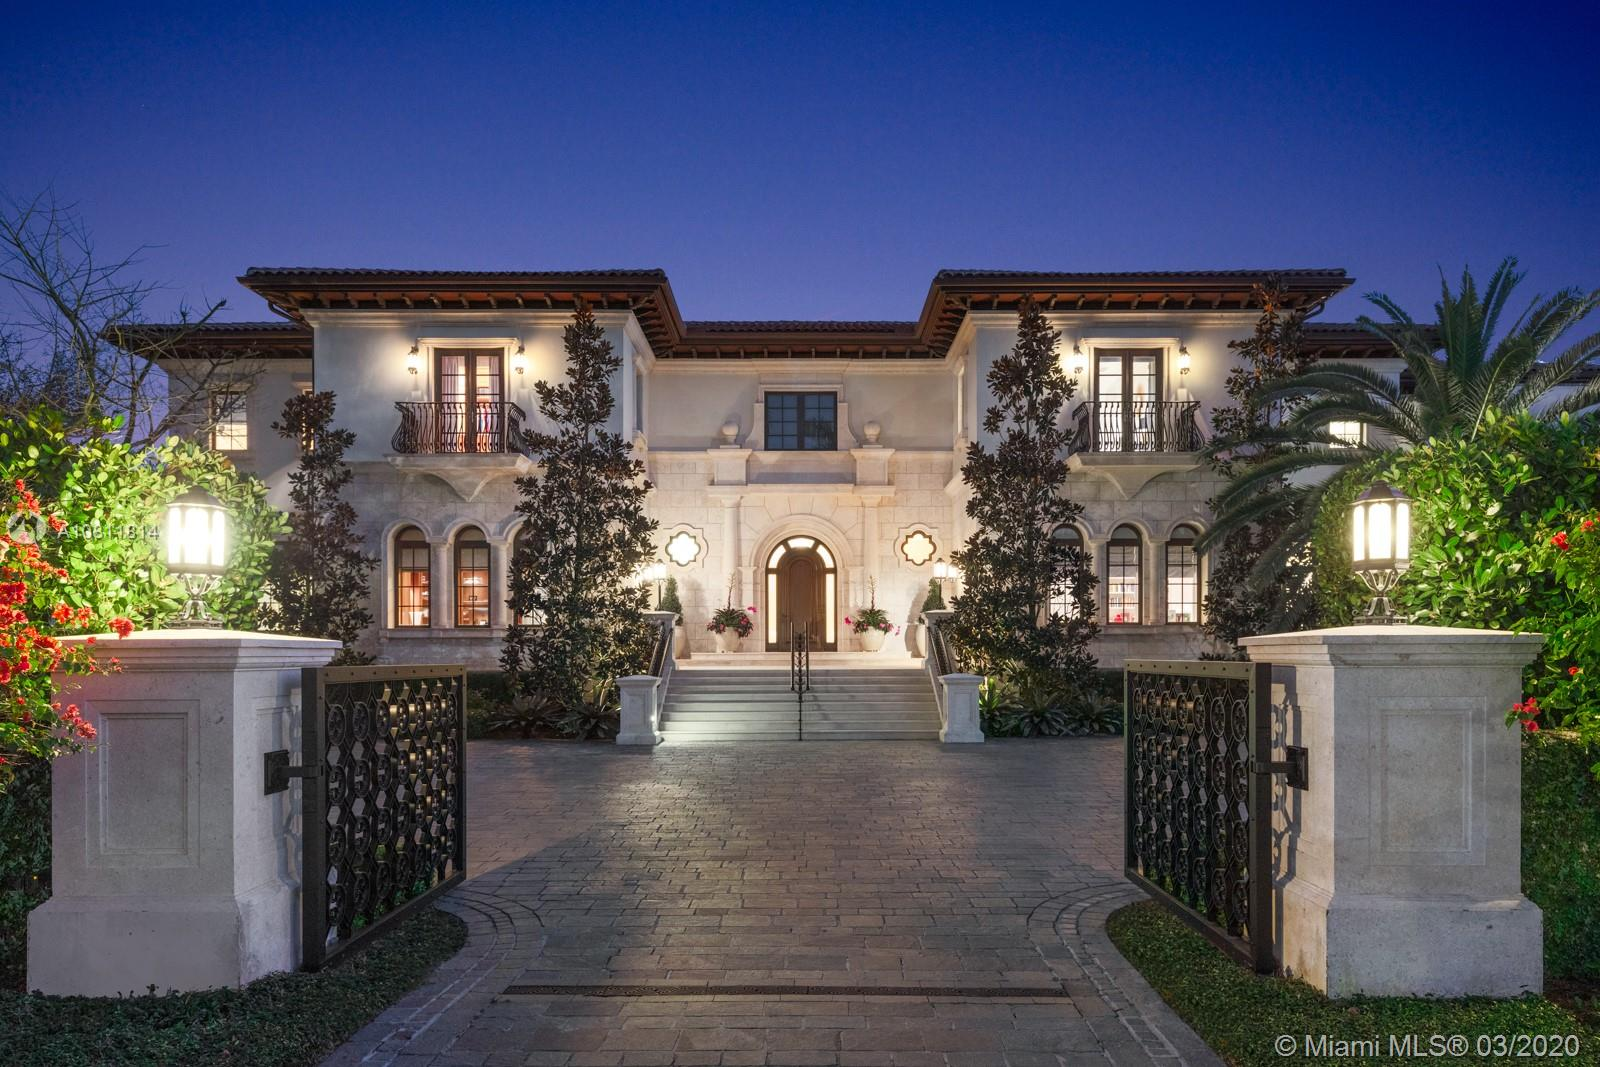 image #1 of property, Gables Estates No 3